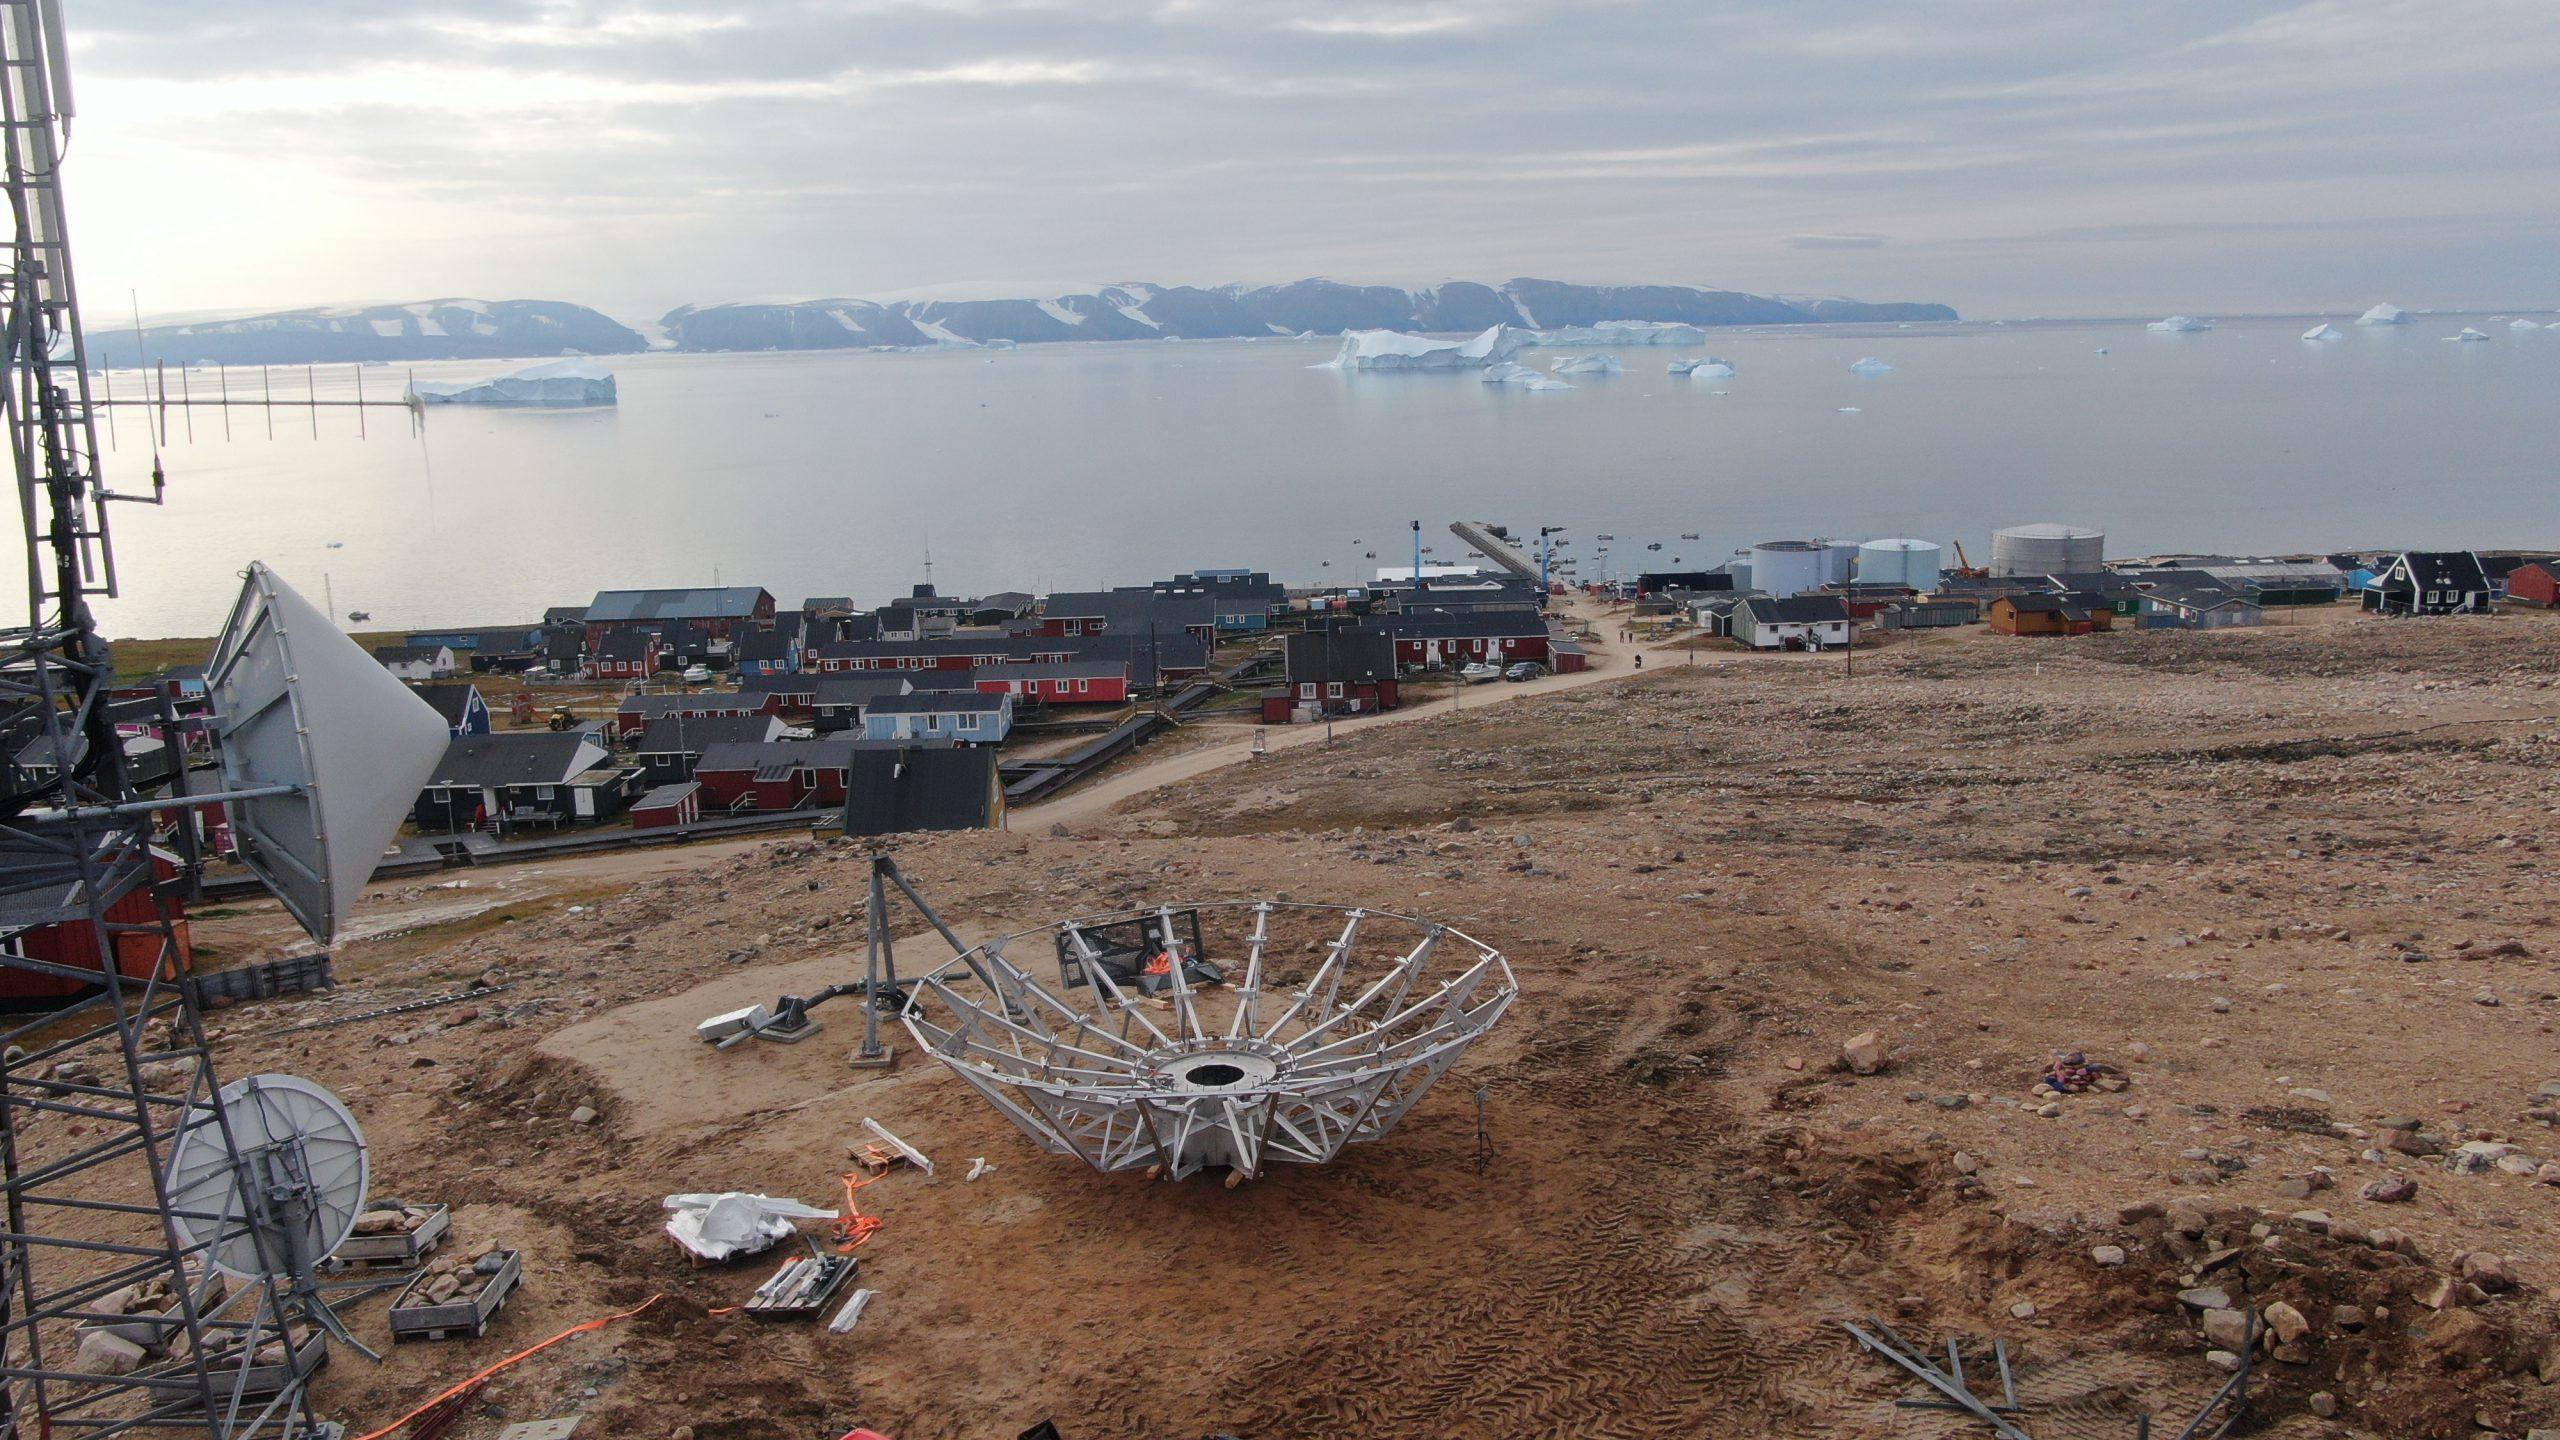 VertexRSI 7.2m installation in Qaanaaq, North-East Greenland